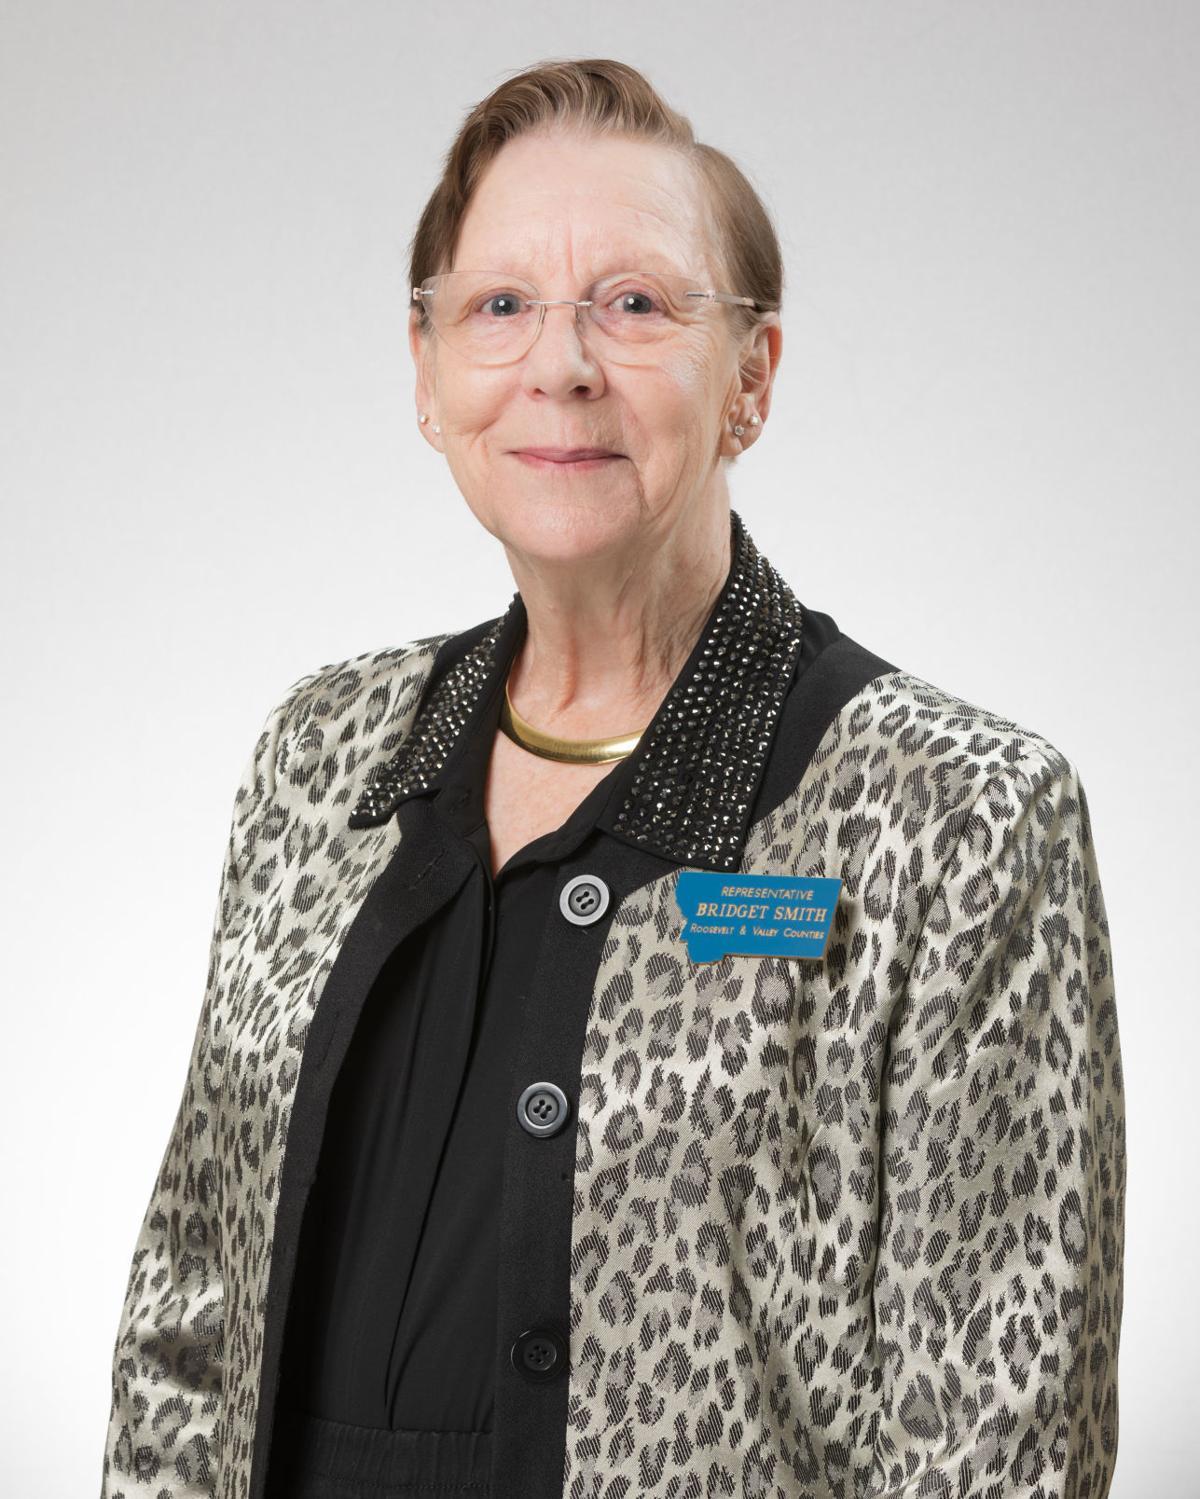 Rep. Bridget Smith